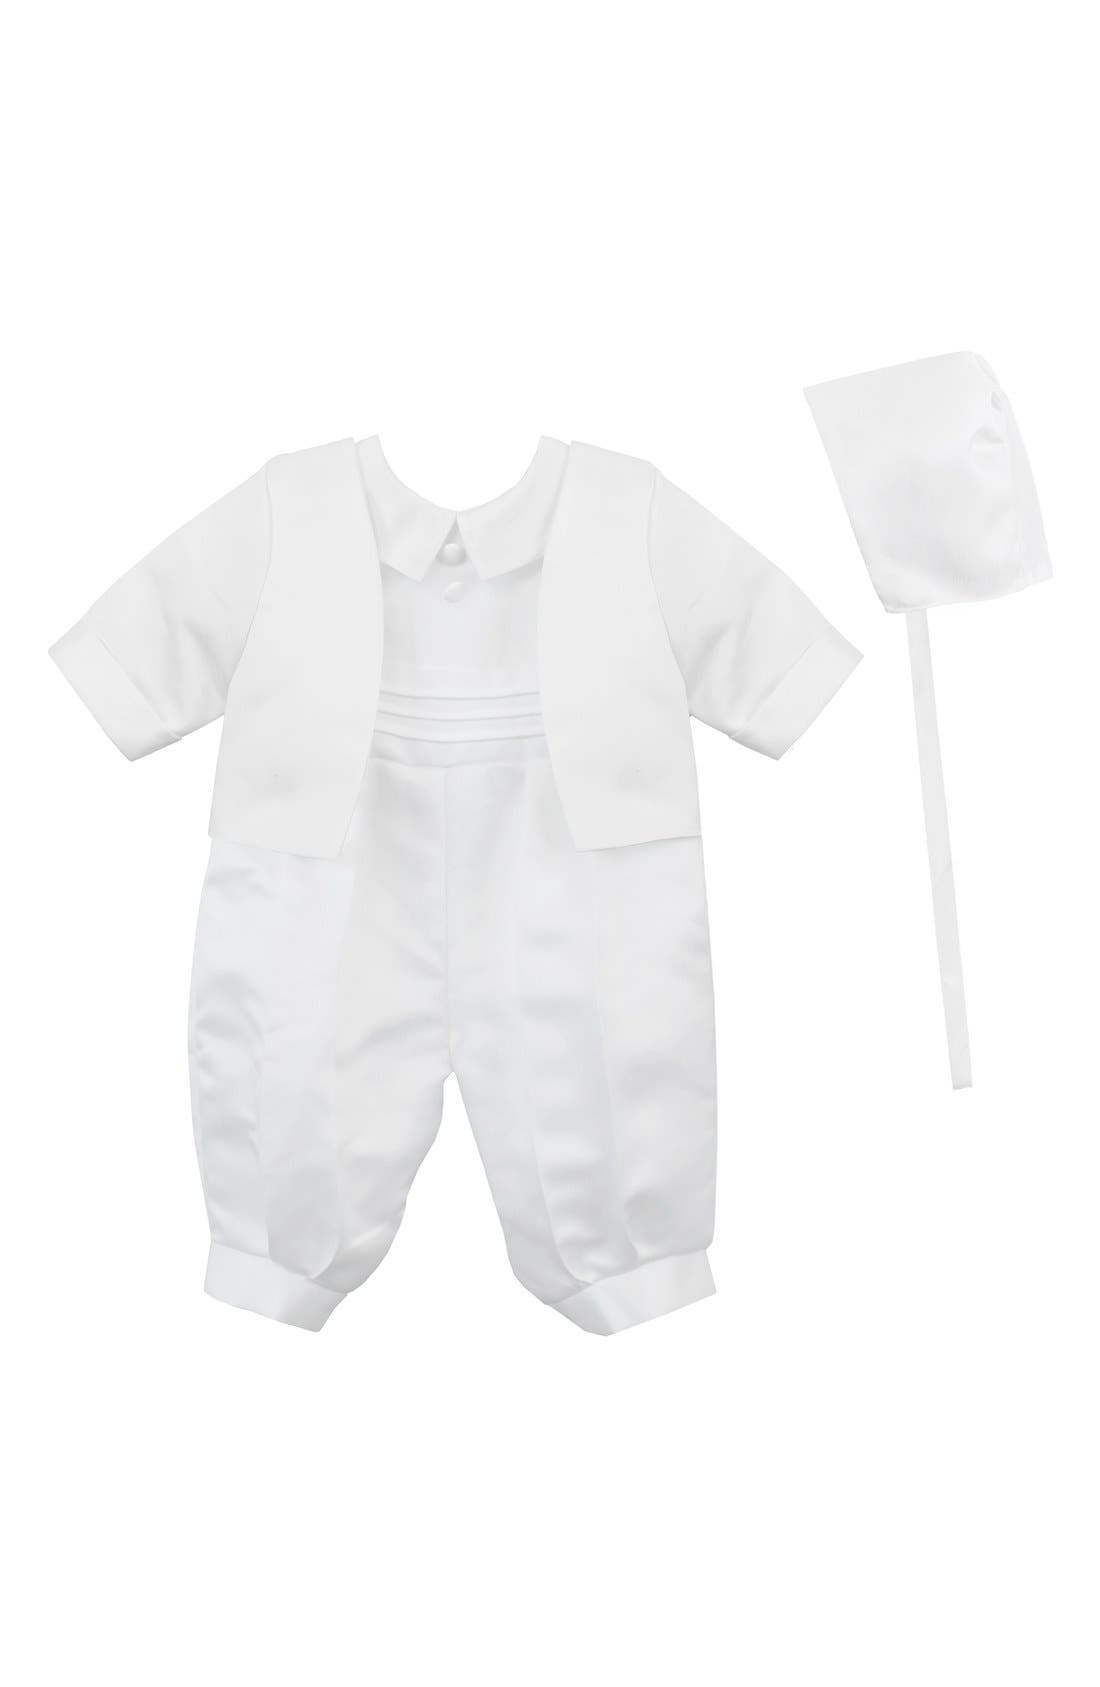 Infant Boys Ci Castro  Co Christening Romper  Cap Size 9M  White